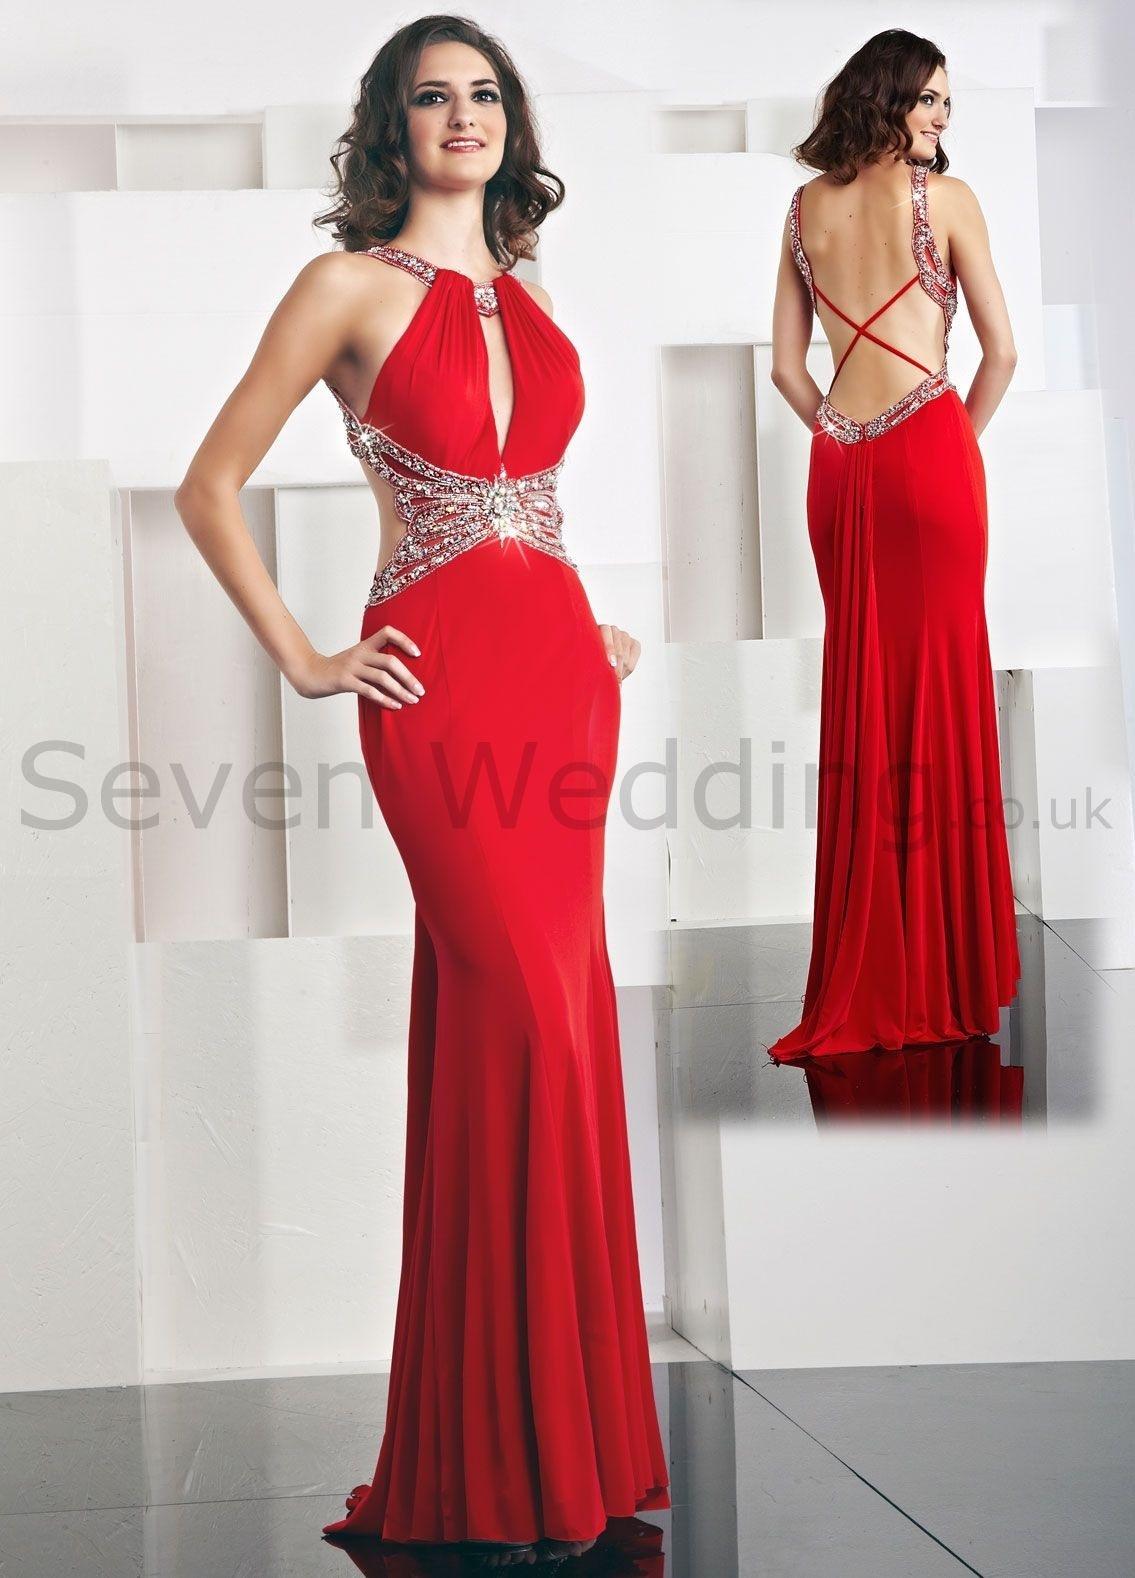 20 Schön Abendkleider Lang Online Shop SpezialgebietFormal Ausgezeichnet Abendkleider Lang Online Shop Boutique